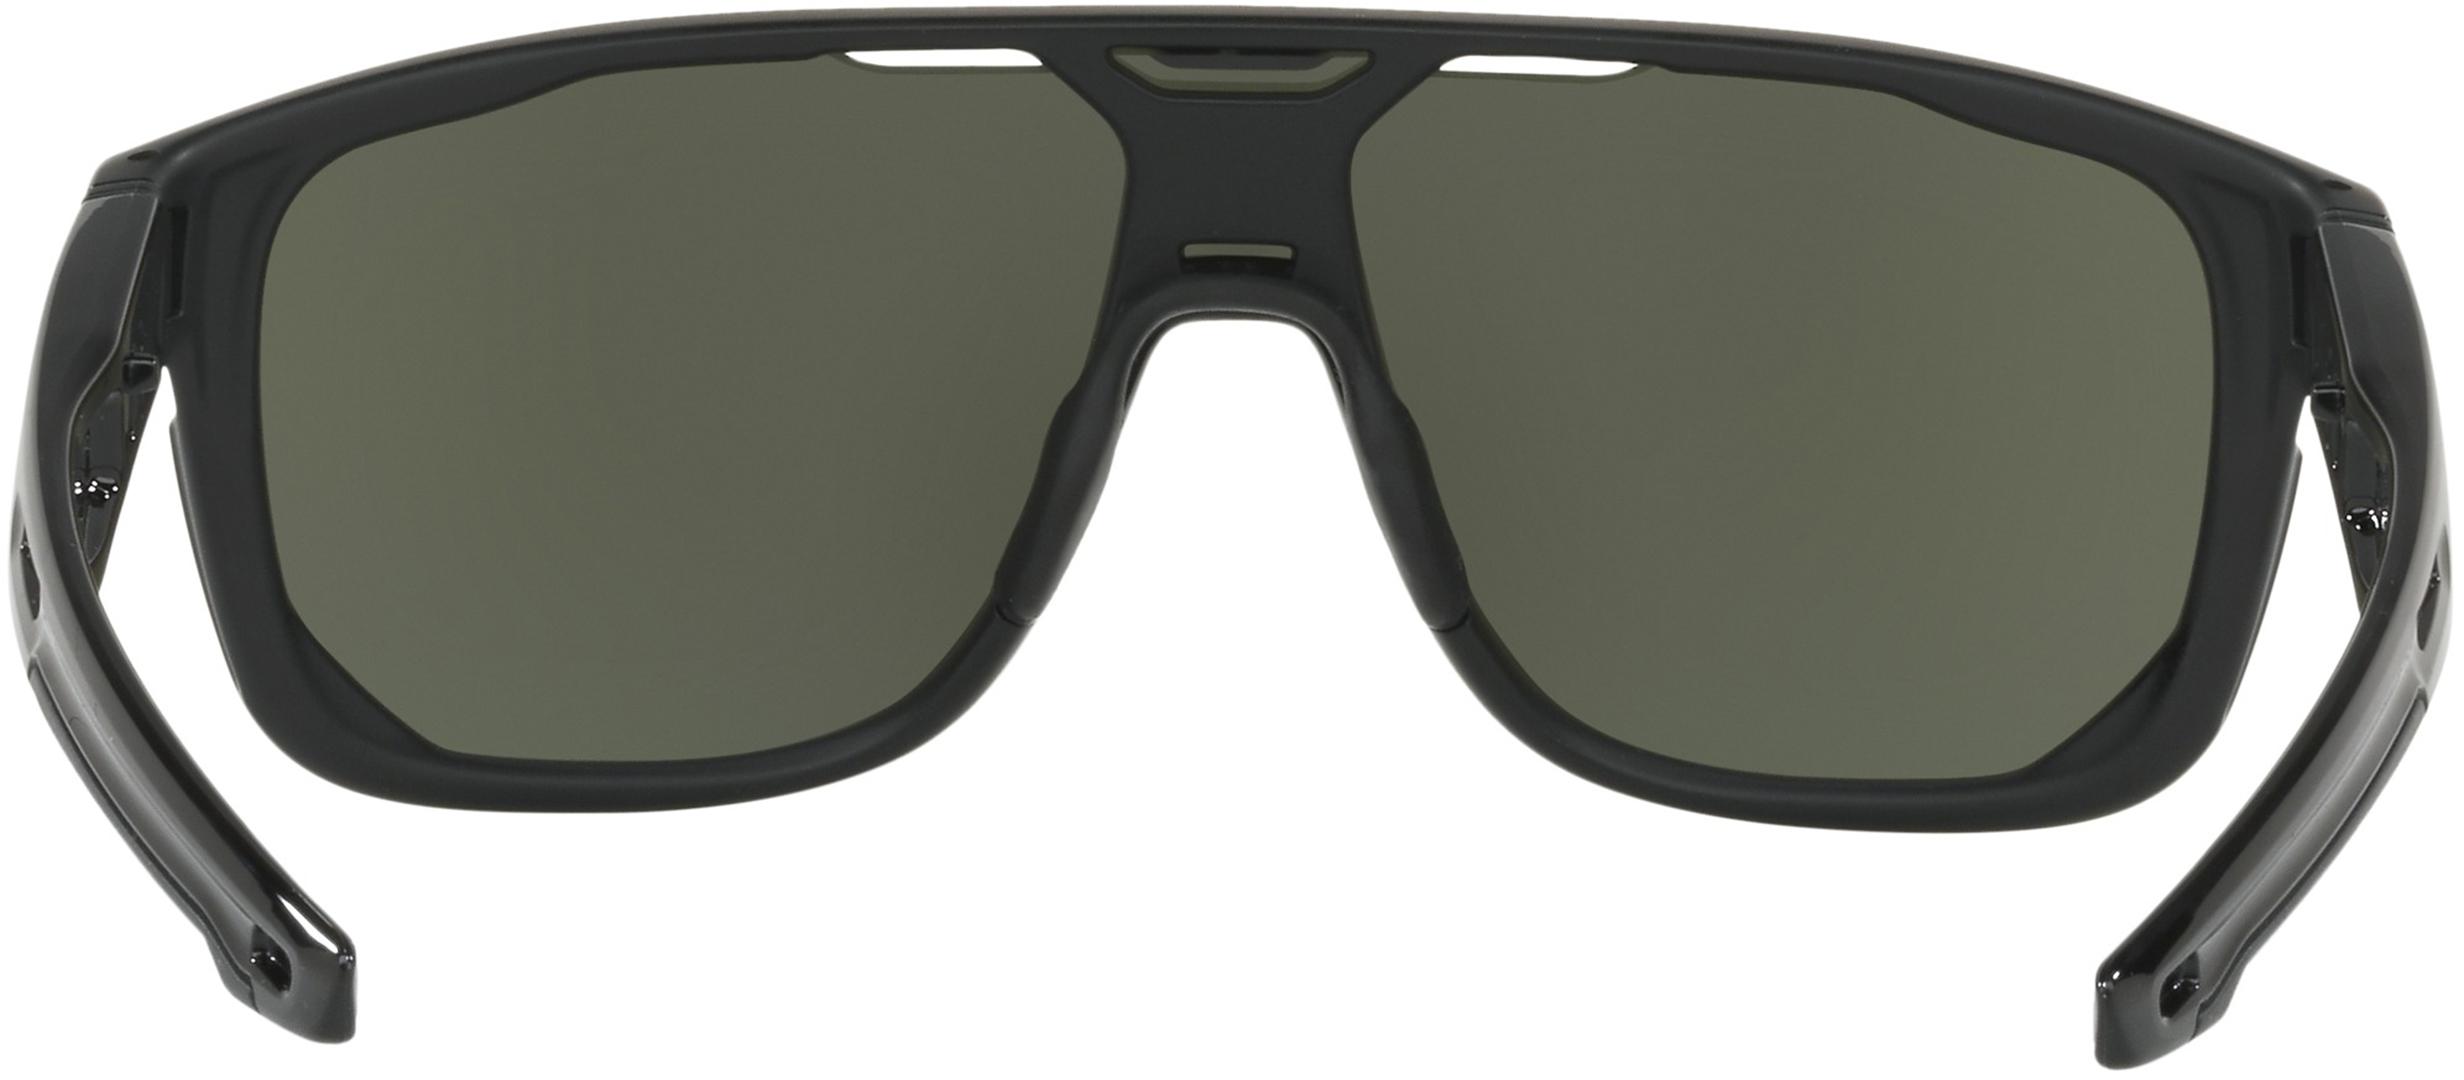 CROSSRANGE SHIELD Sonnenbrille matte black/prizm black | Warehouse One